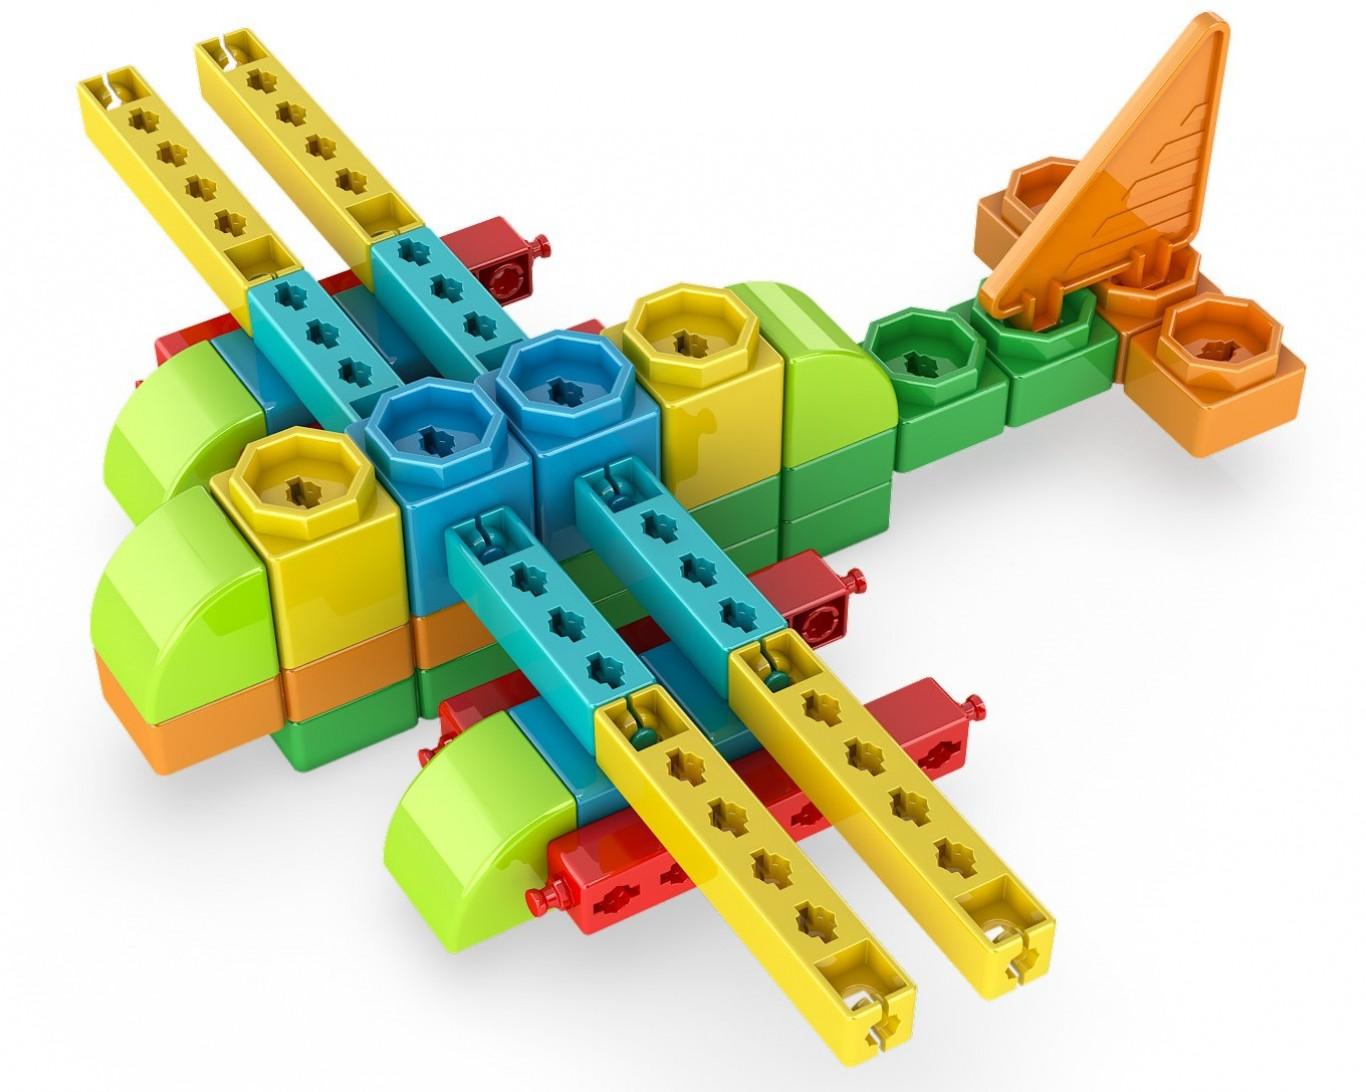 Set de constructie - Qboidz 4in1 - Stunt Plane | Engino - 1